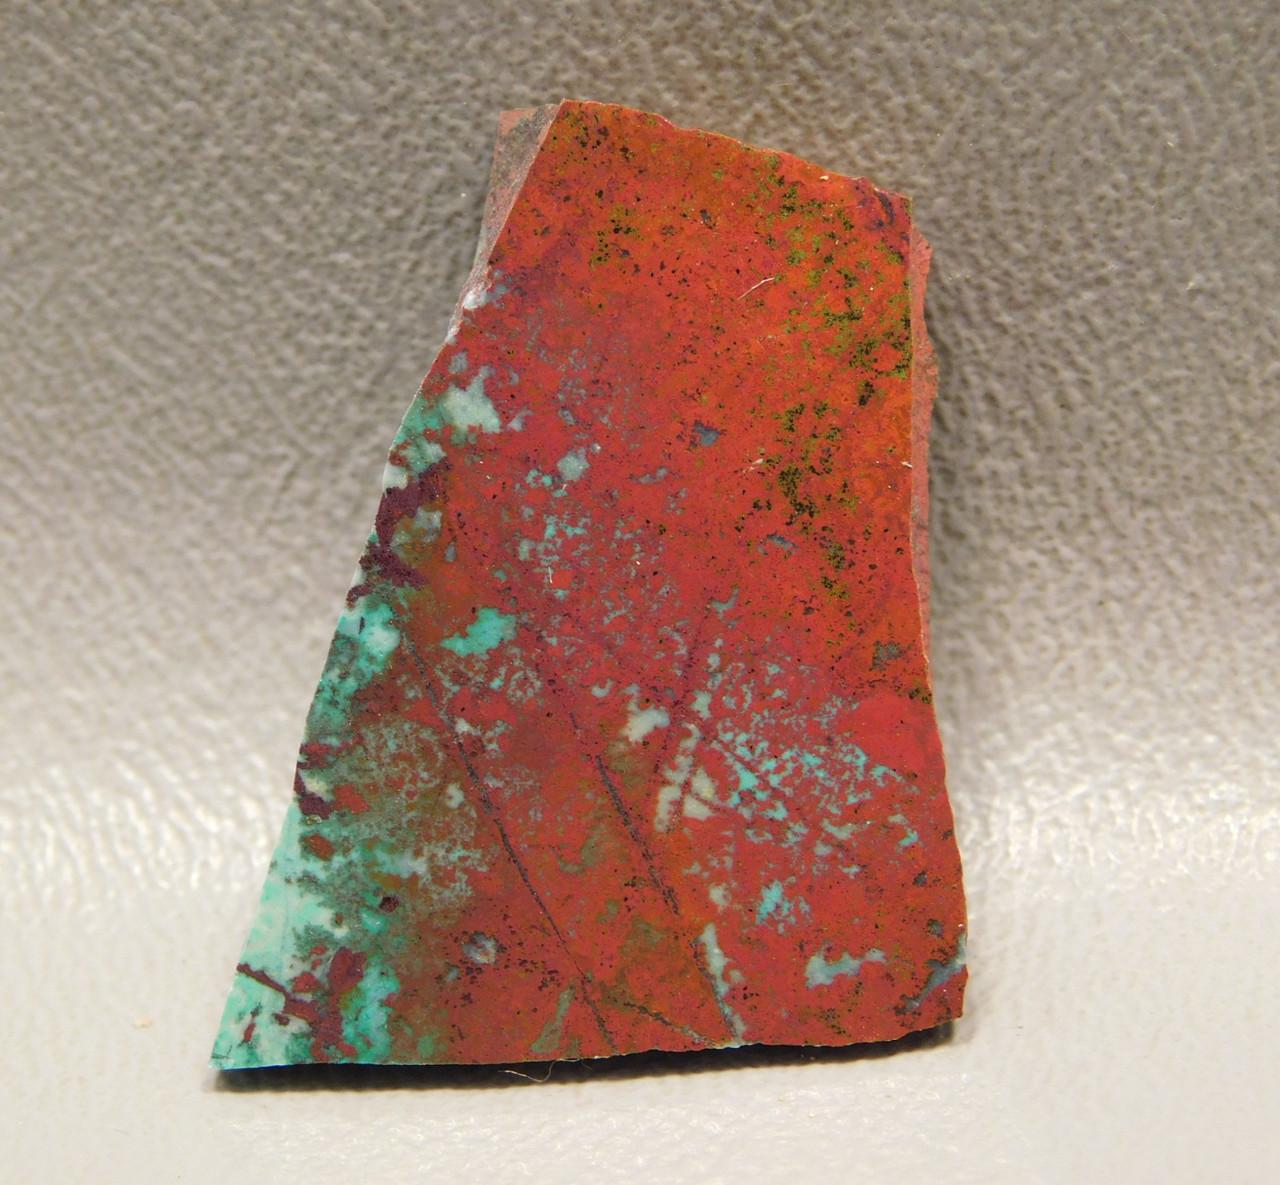 Sonoran Sunrise Polished Slab Natural Stone Cabochon Wirewrap #S10